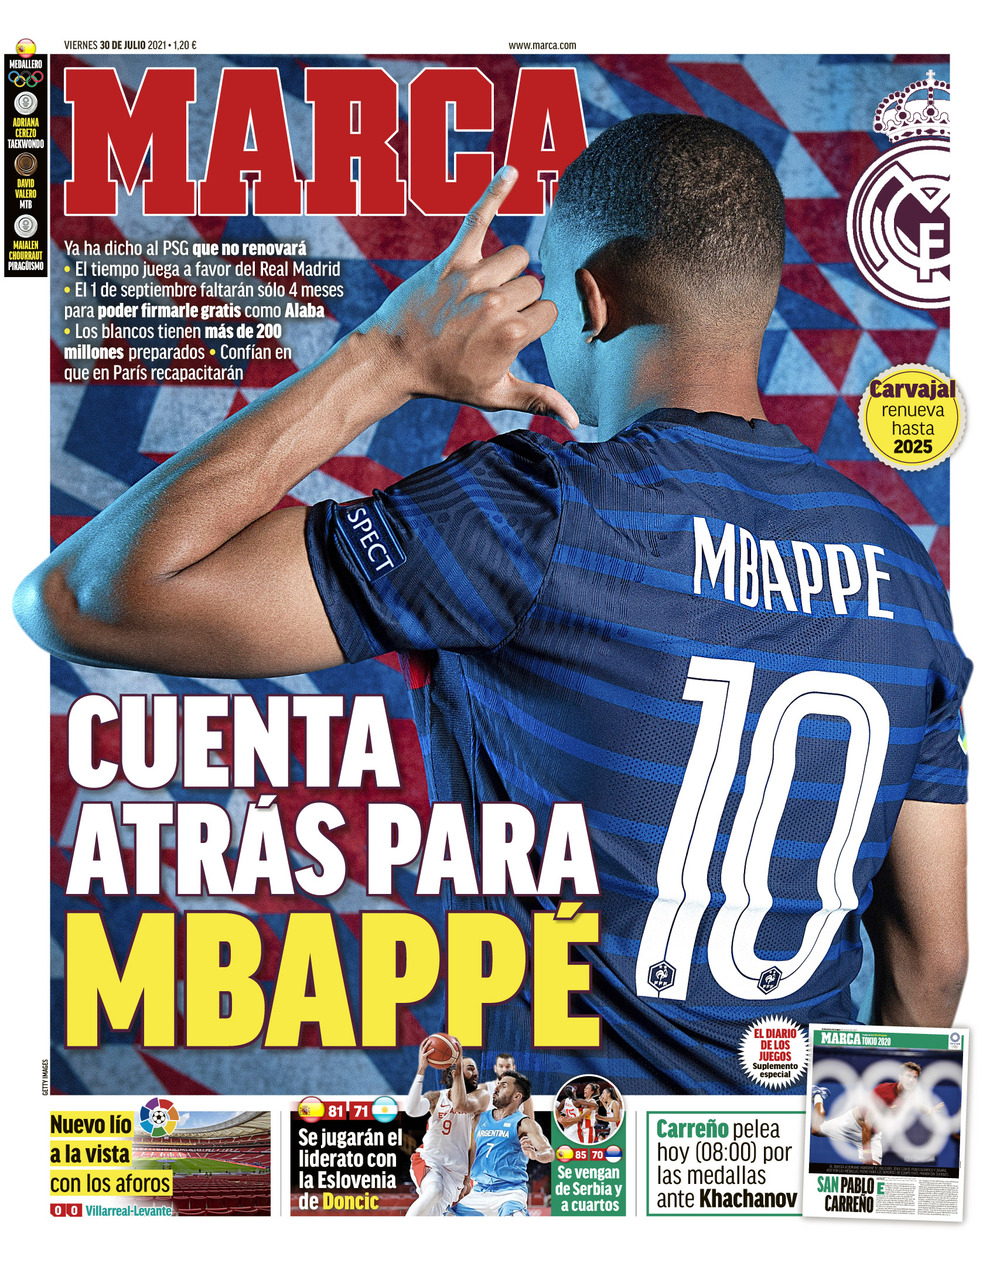 Documentos de hoy: cuenta atrás para Mbappé mientras Koeman entra duro